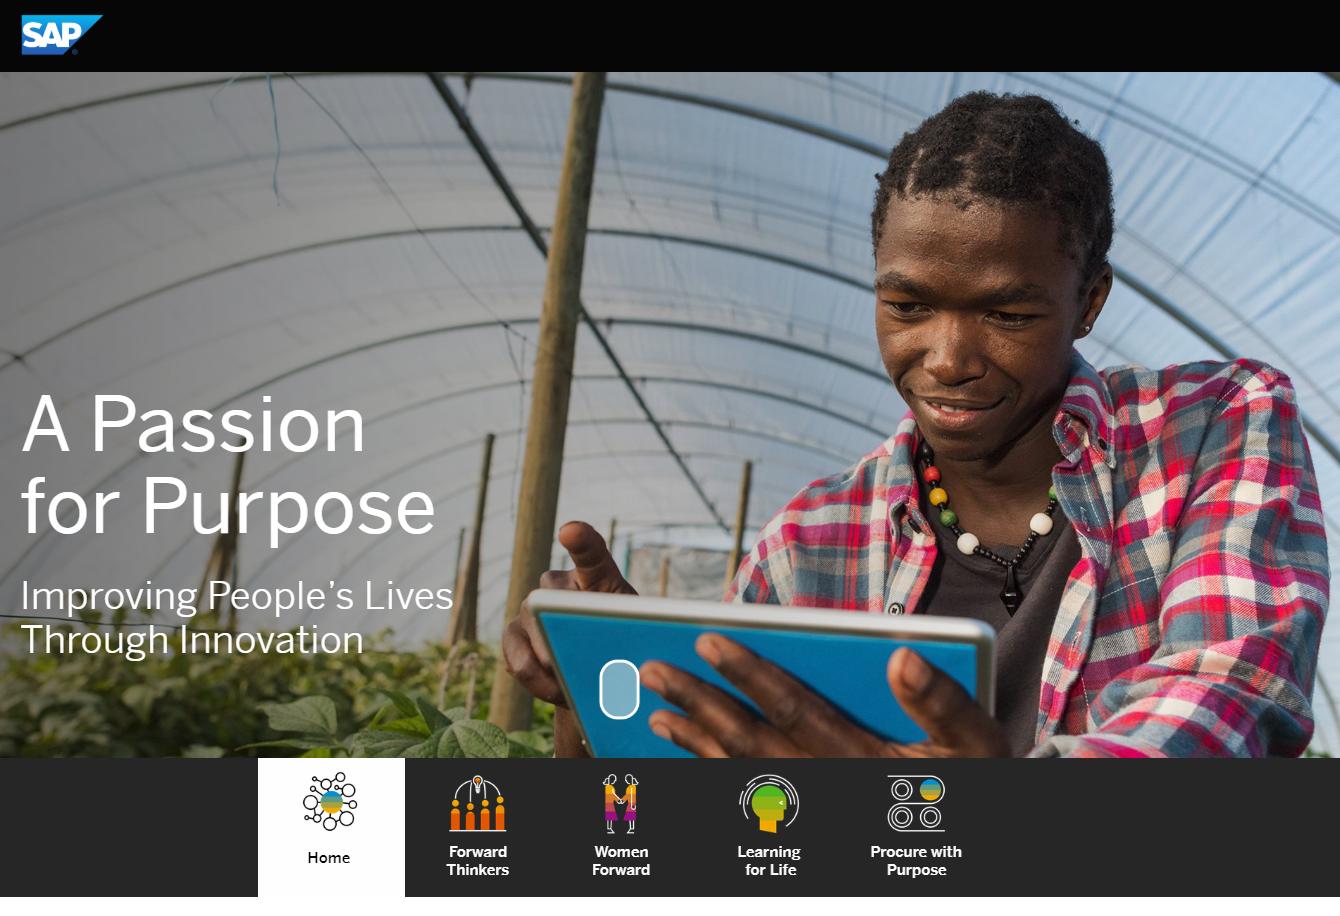 Interactive Influencer Content Program Focused on Purpose